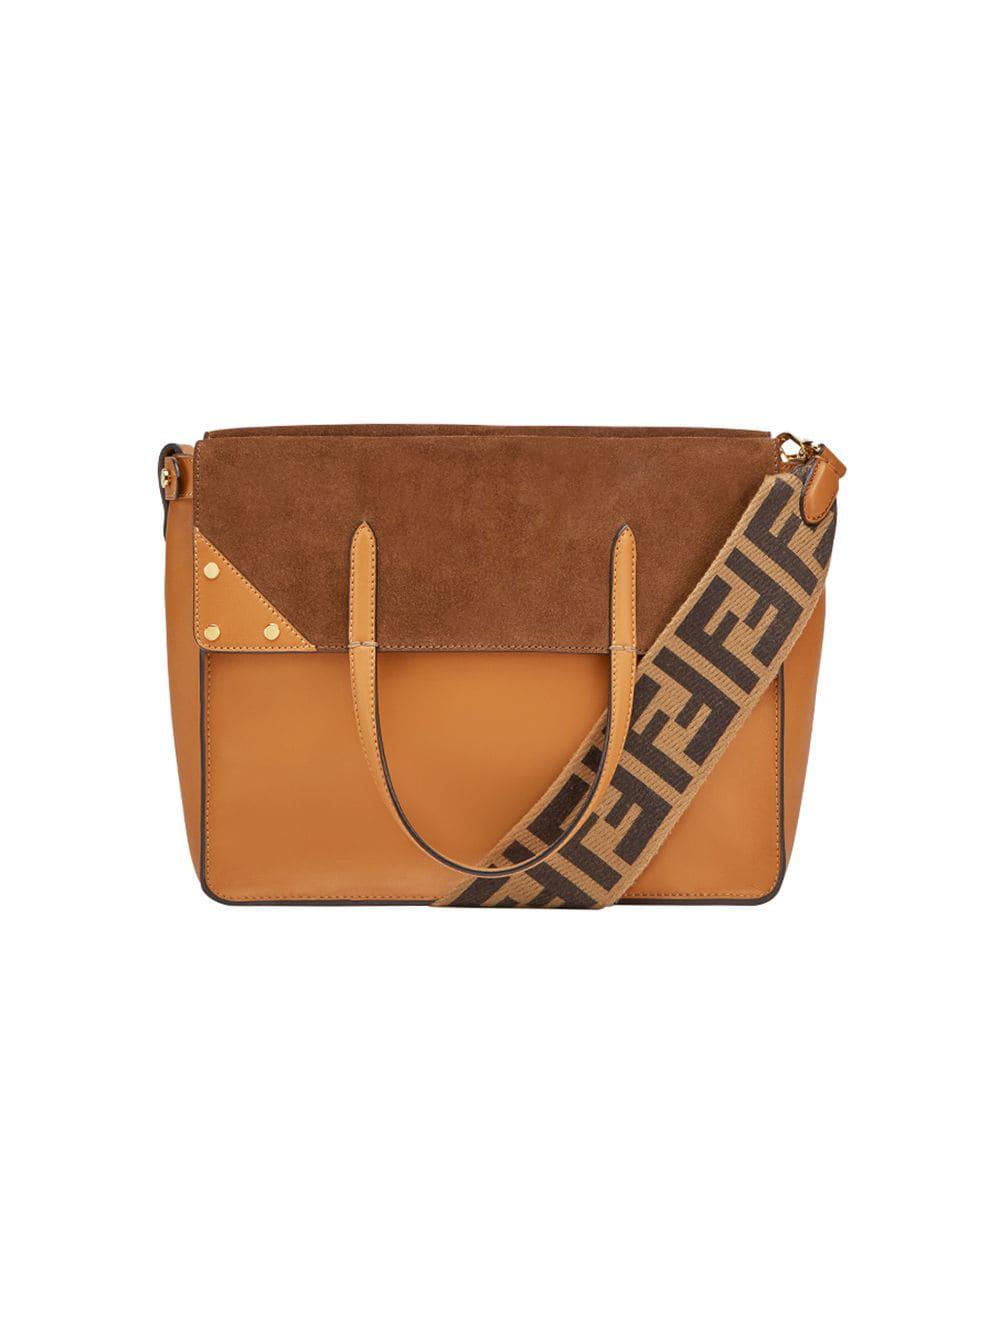 21dfc39f905d Fendi Flip Leather And Suede Shoulder Bag In Brown